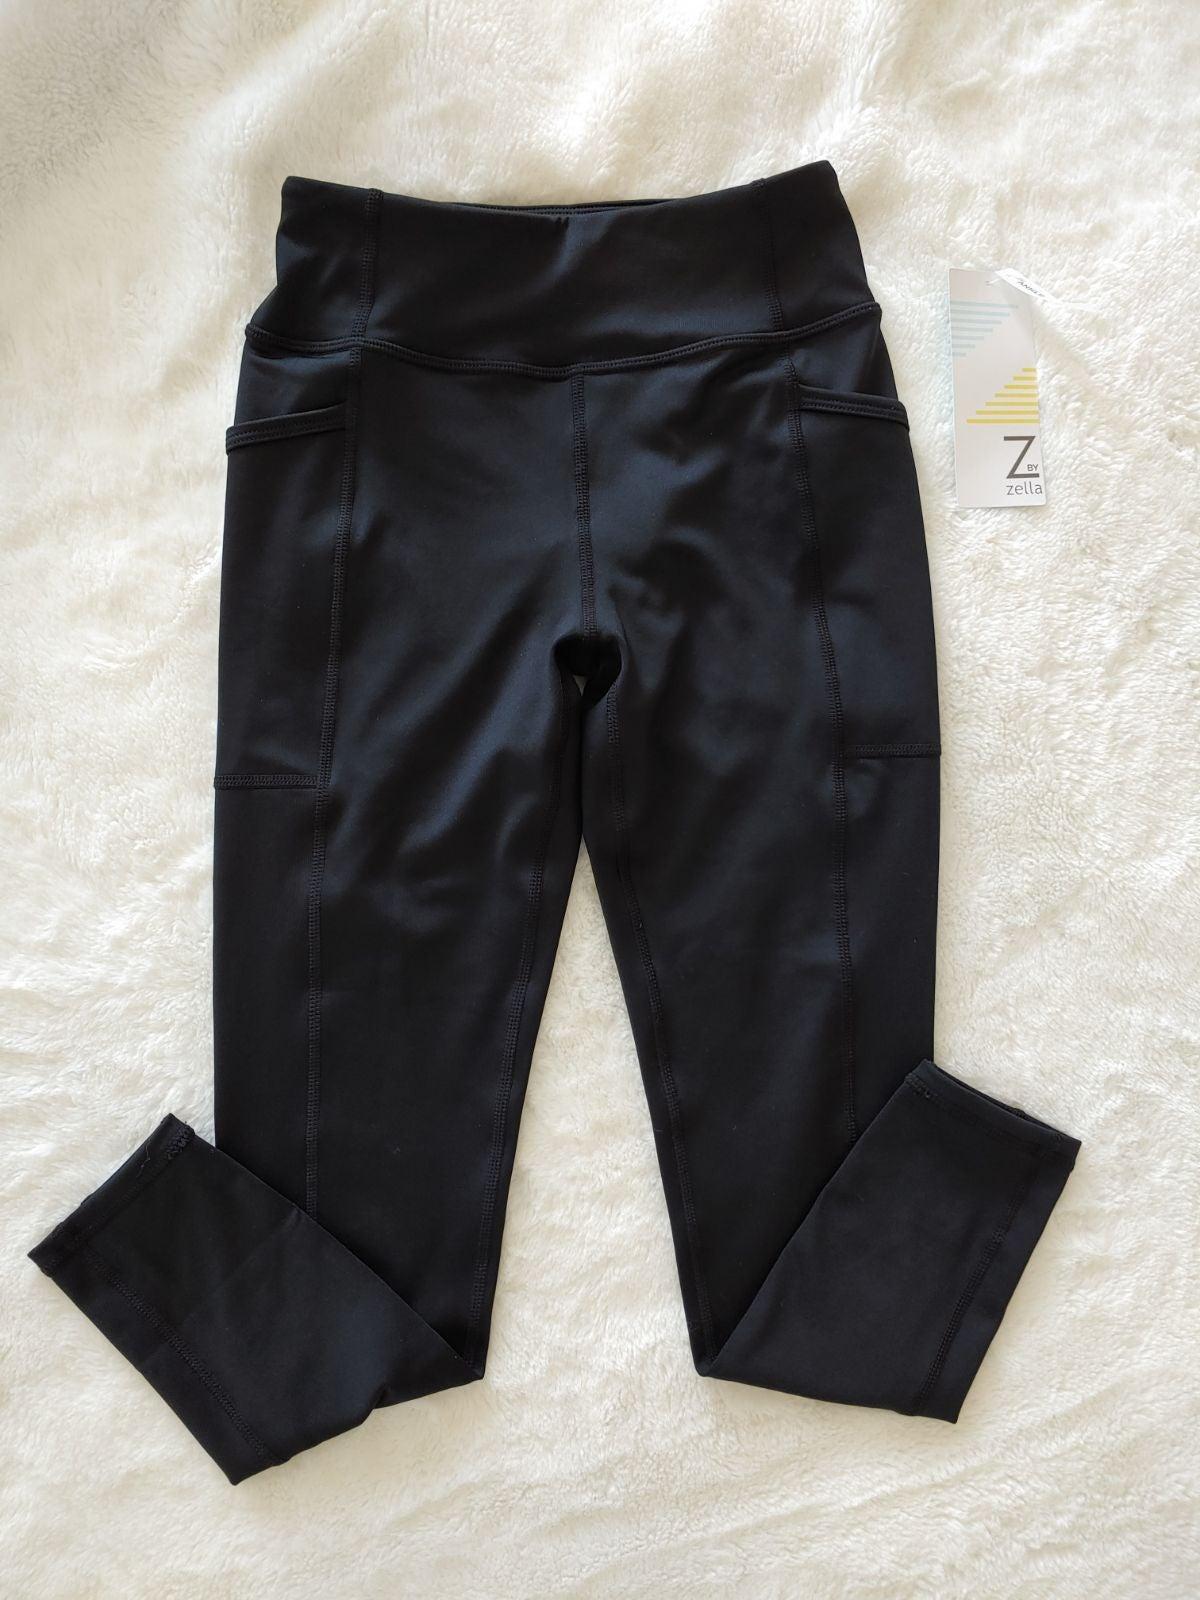 Girls black zella leggings w pockets siz